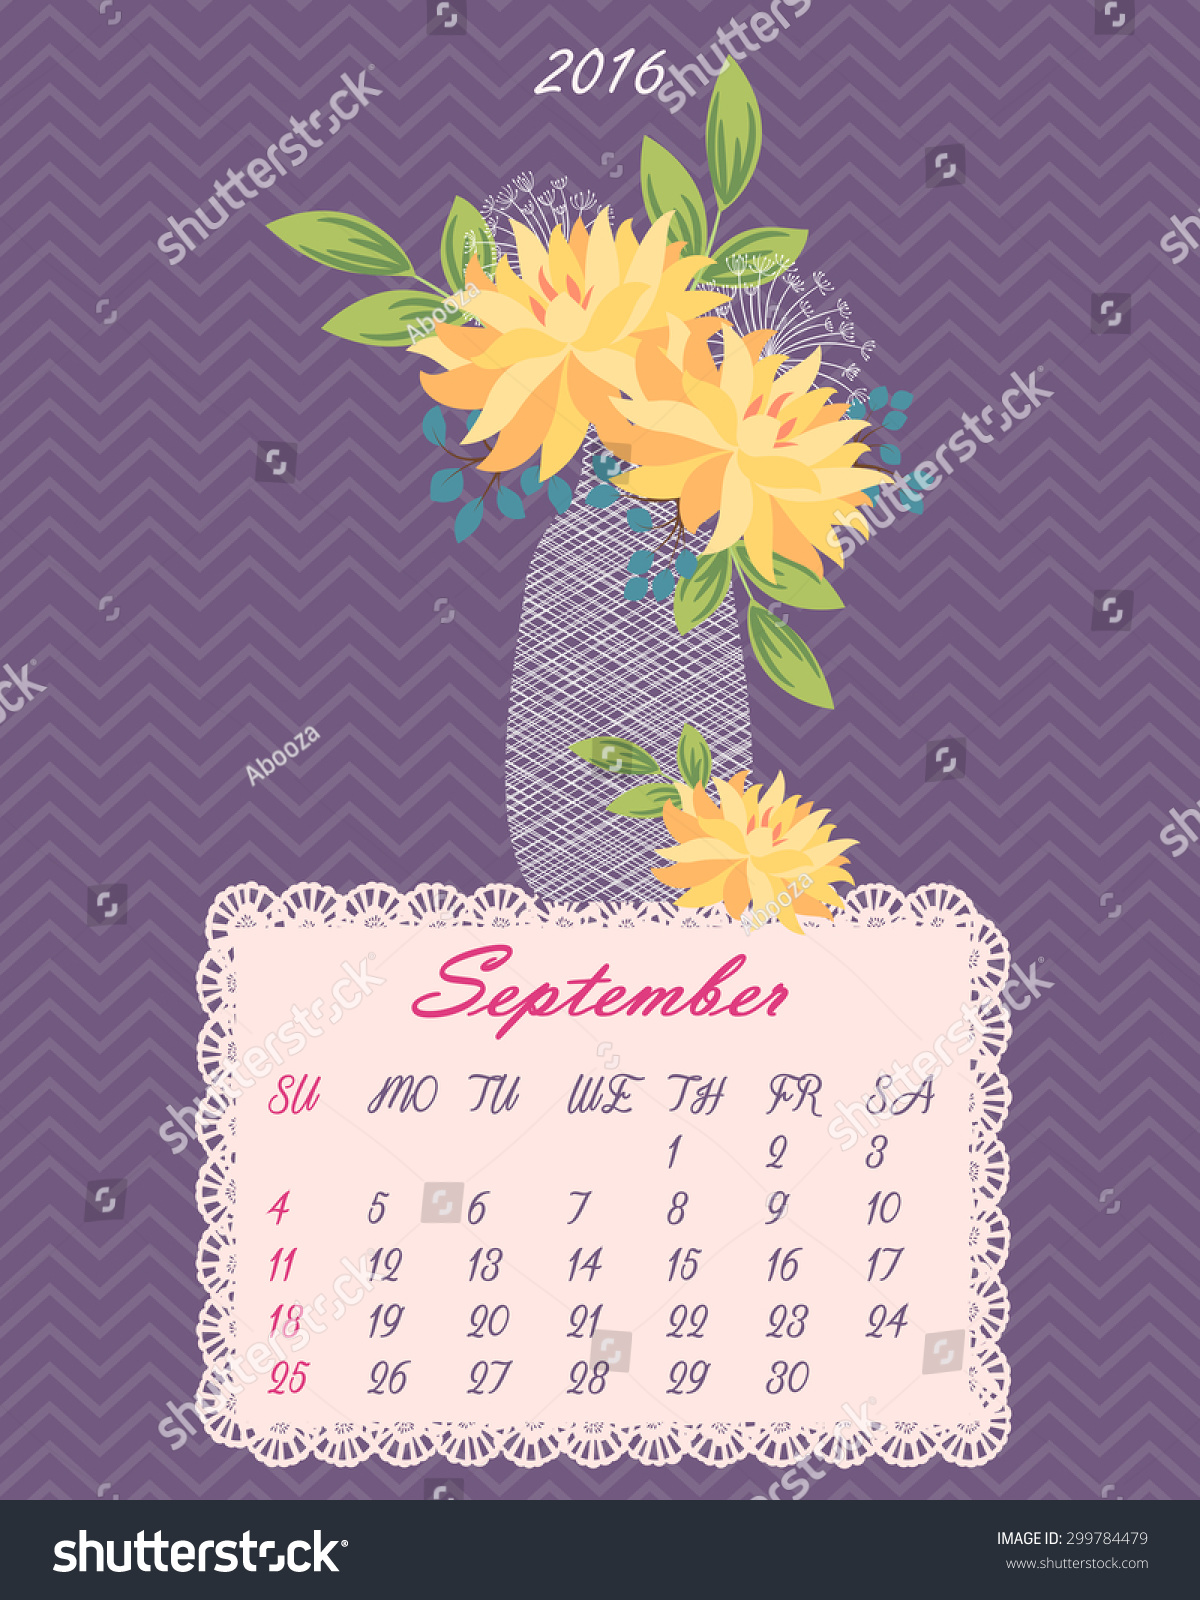 List floral calendar 2016 year flowers stock vector 299784479 list of floral calendar for 2016 year flowers in vase vector background izmirmasajfo Gallery